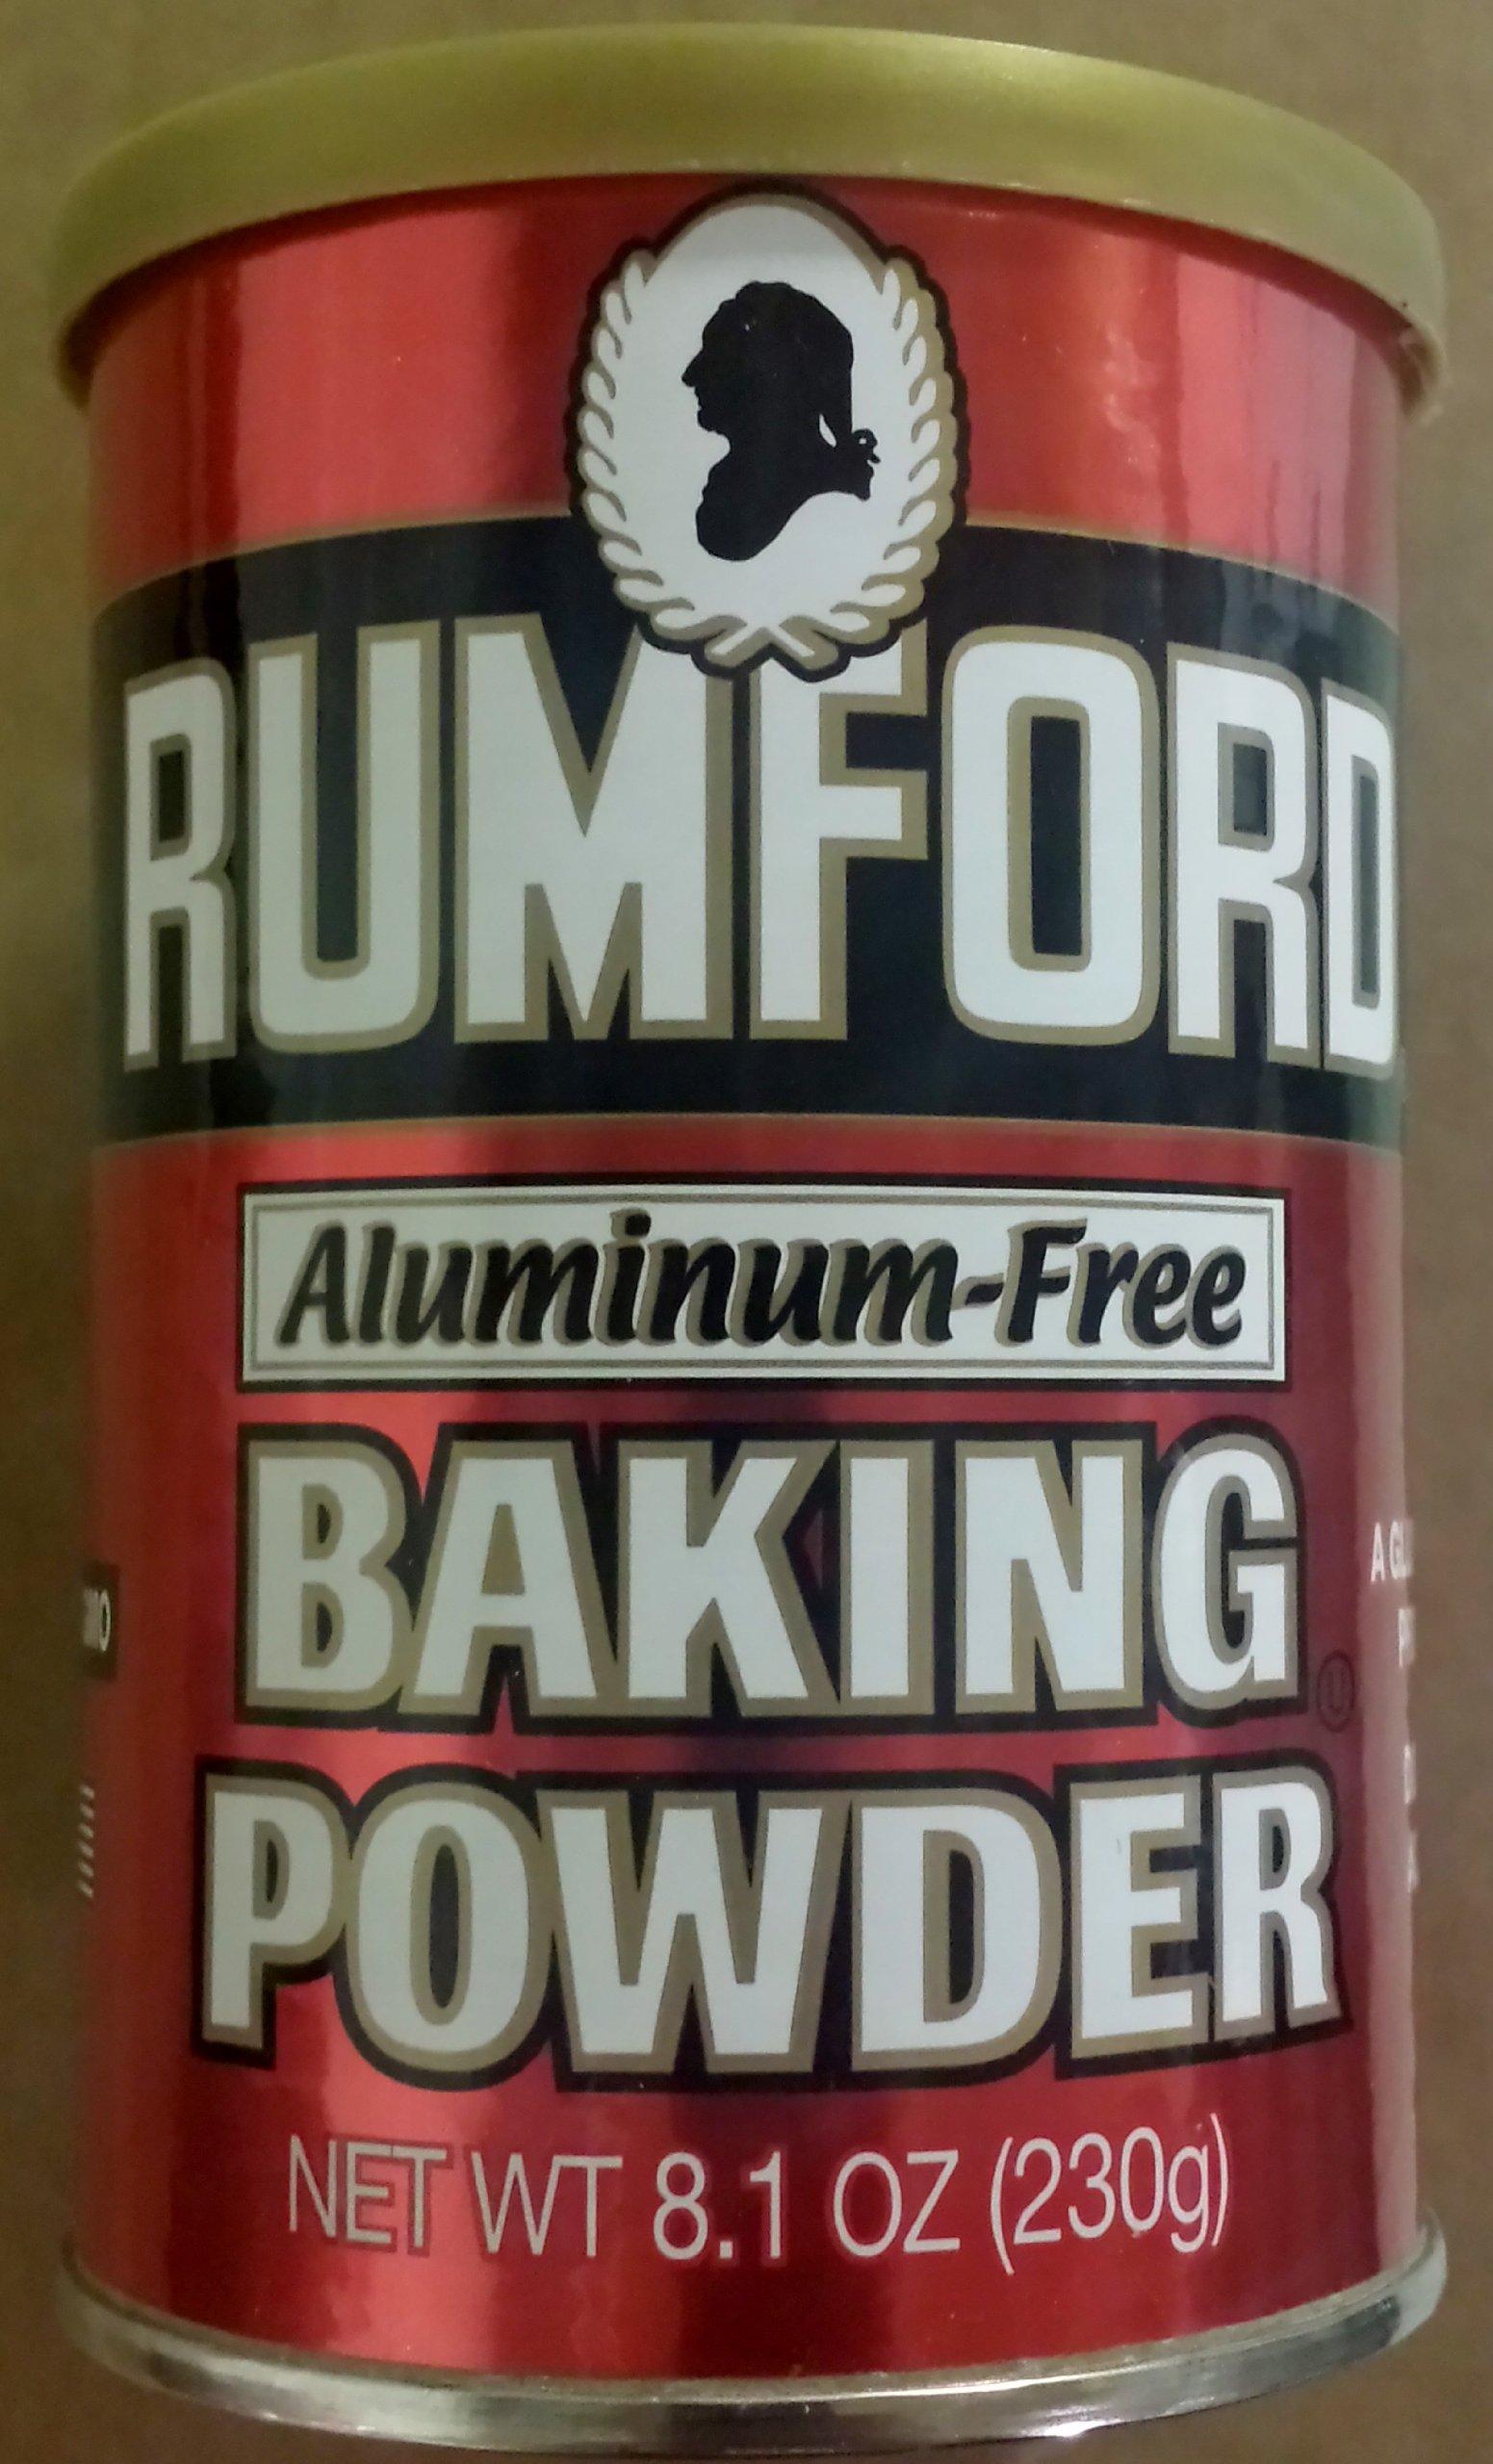 Rumford Baking Powder No Aluminum (3x8.1 OZ)